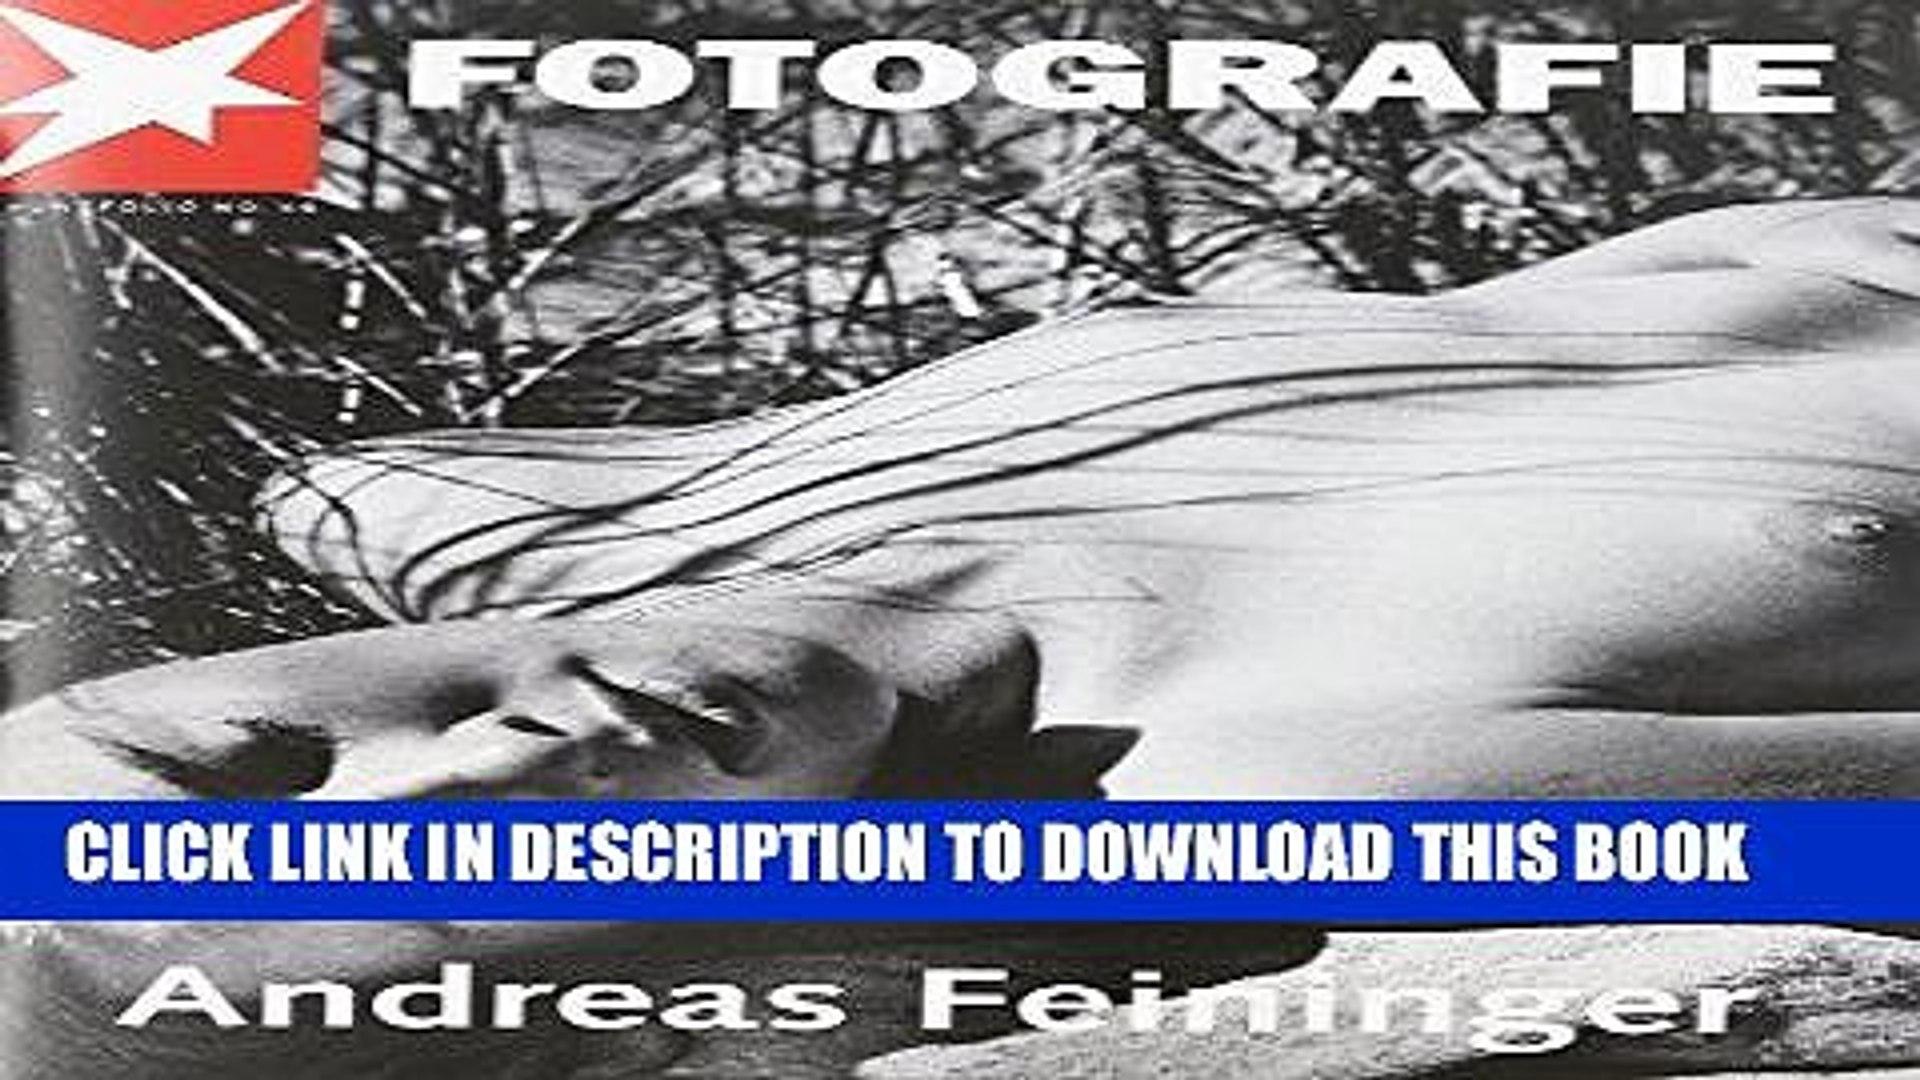 Ebook Andreas Feininger Andreas Feininger Free Read